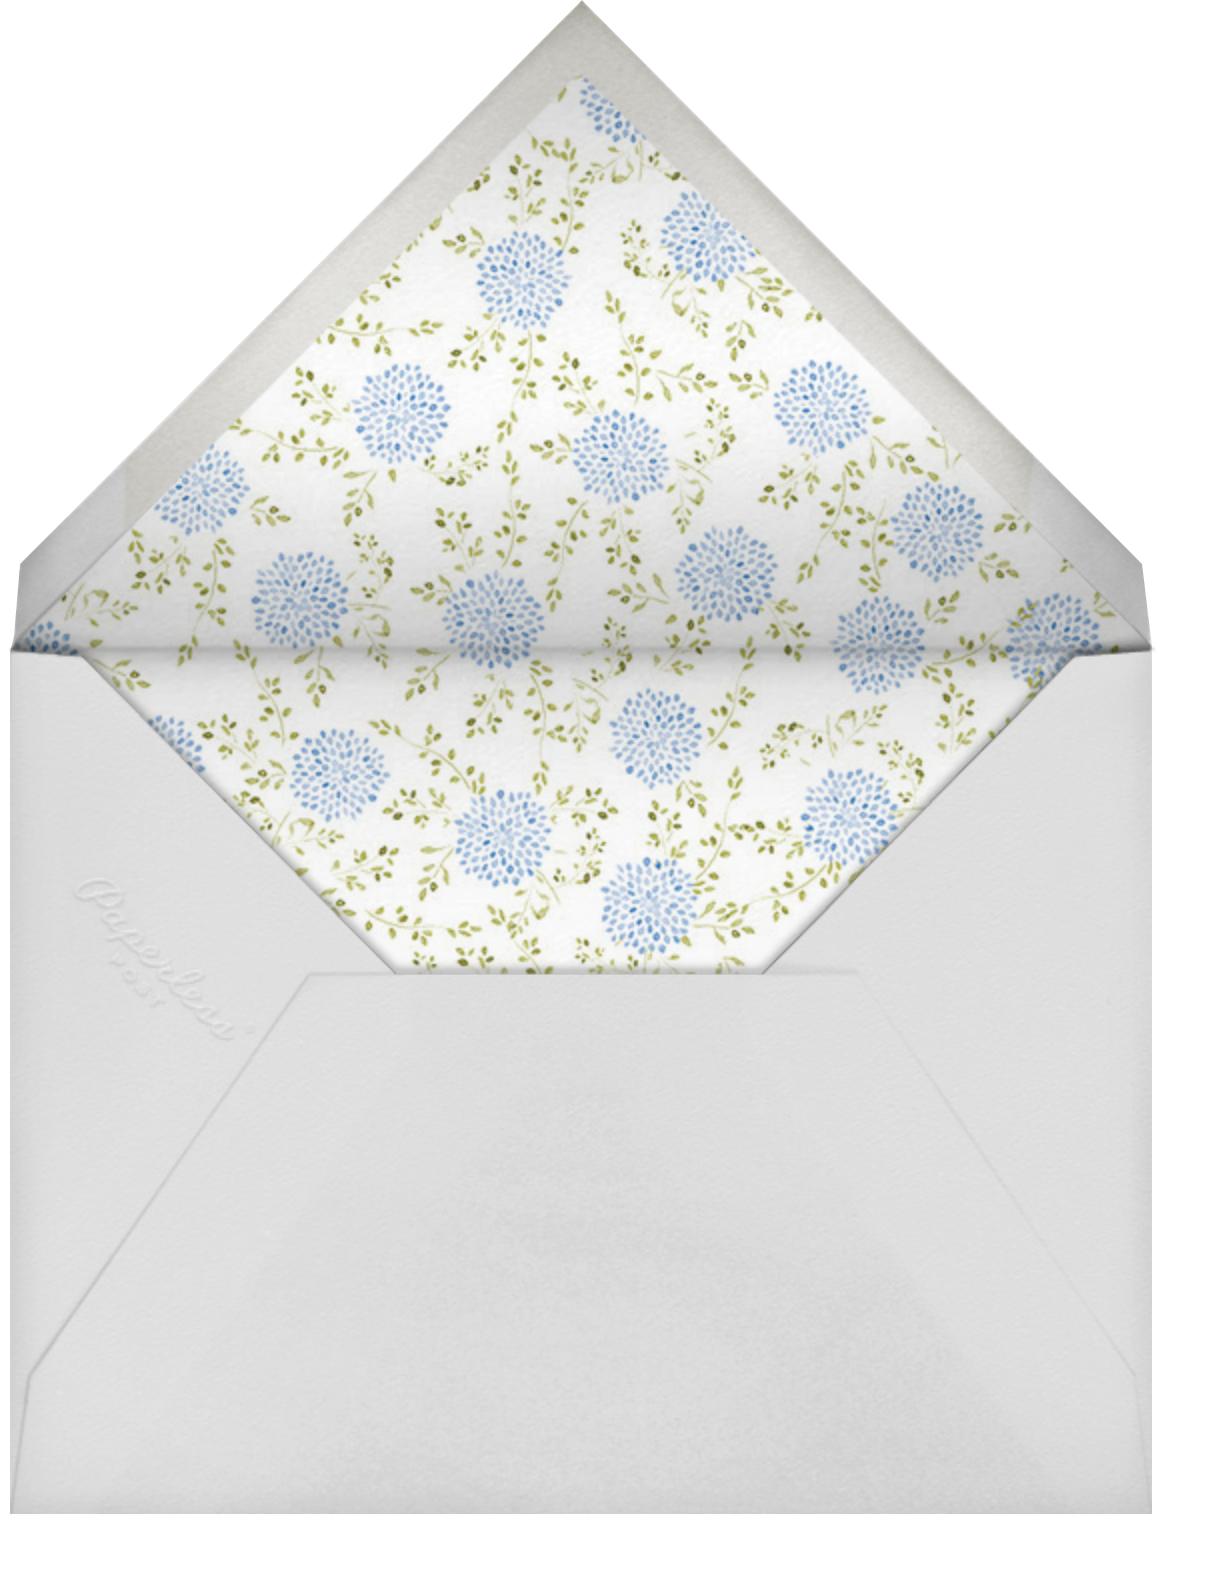 Dahlias (Tall) - Blue - Paperless Post - Virtual parties - envelope back